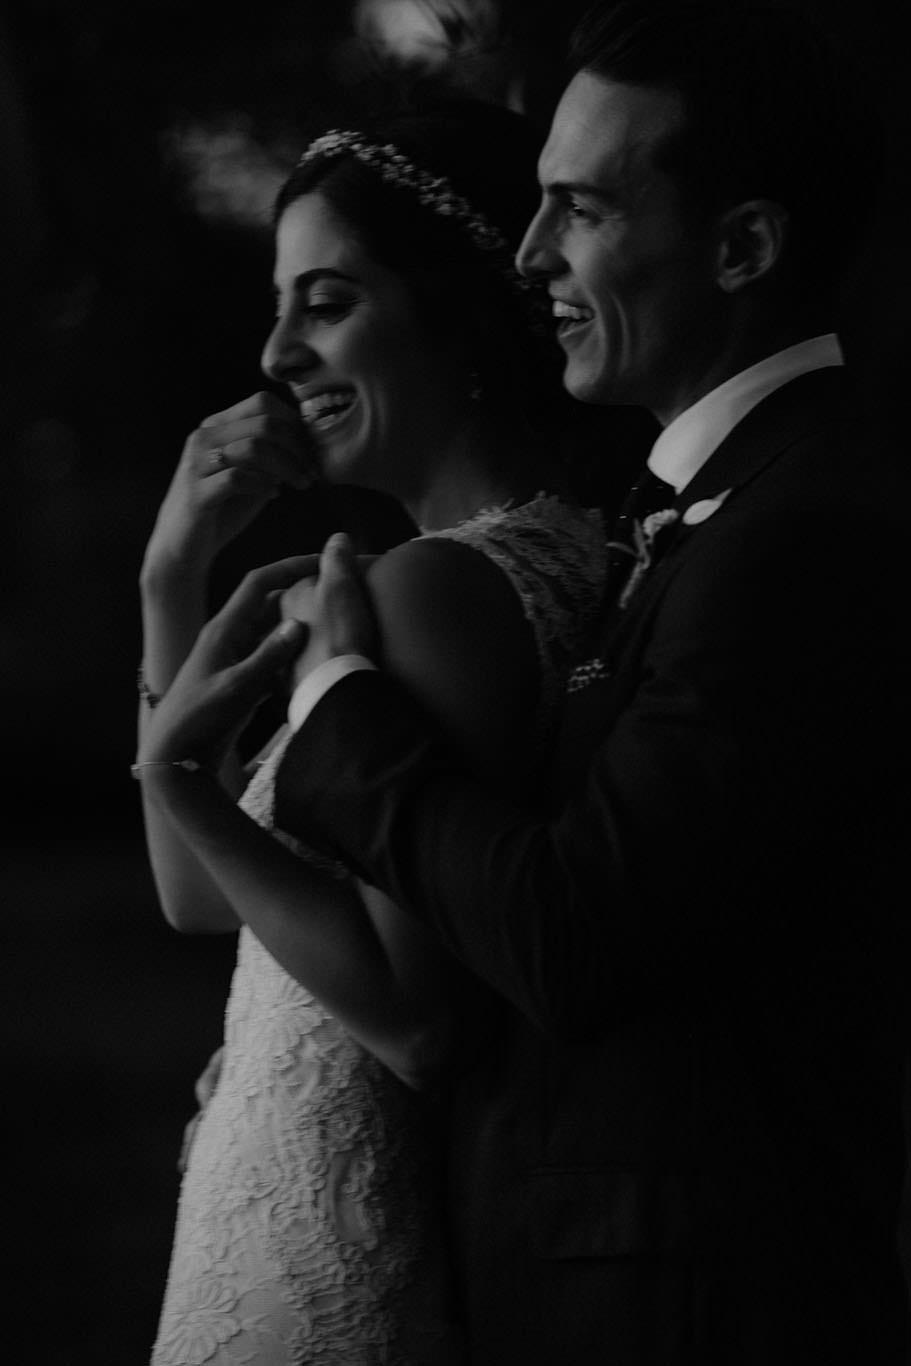 Max-Steph-Italy-Wedding-627.jpg